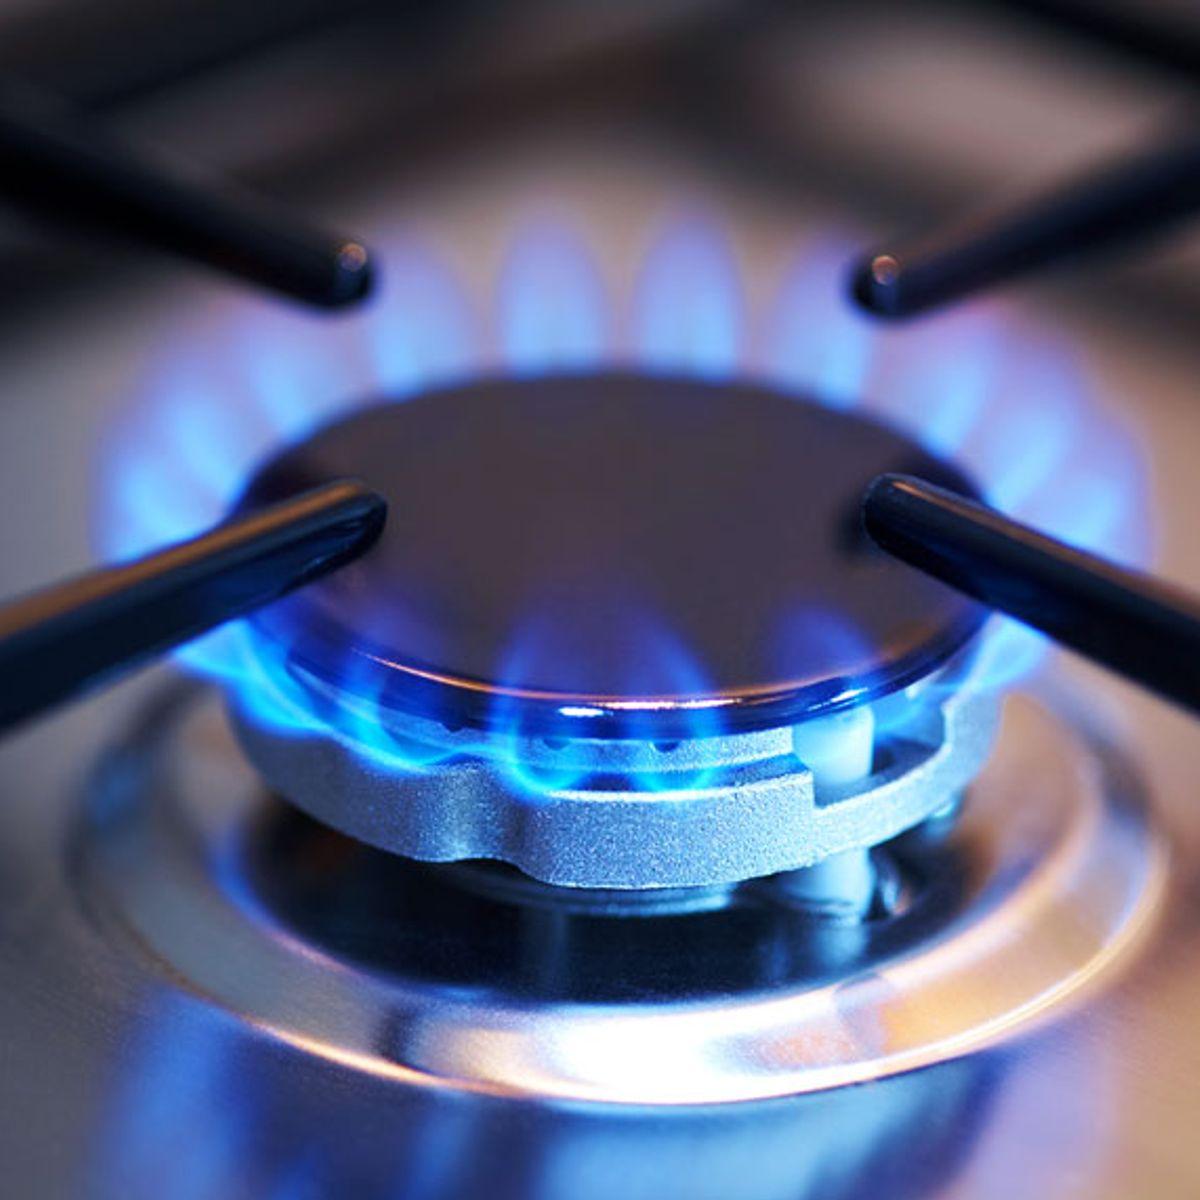 Natural gas surpasses coal in carbon emissions